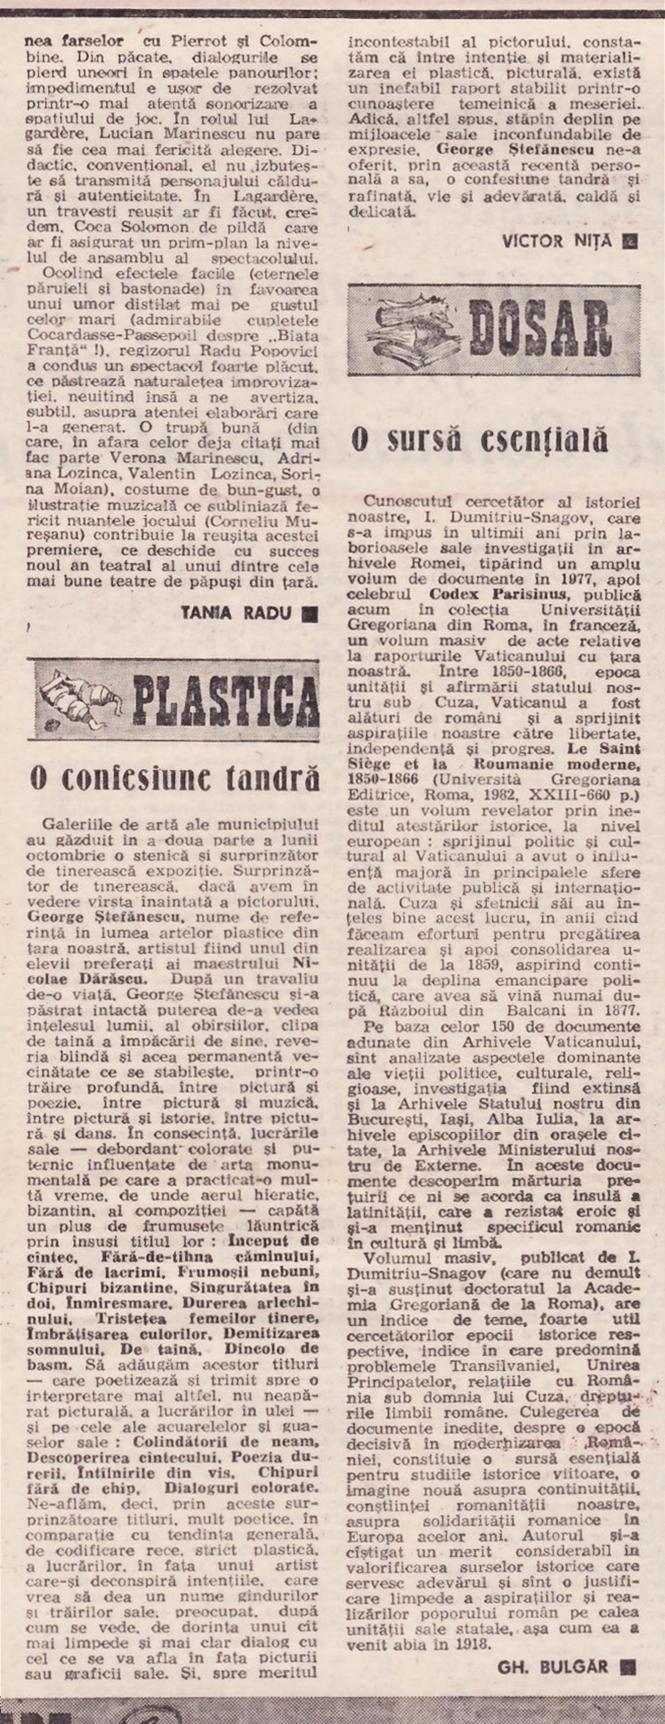 1983 vn